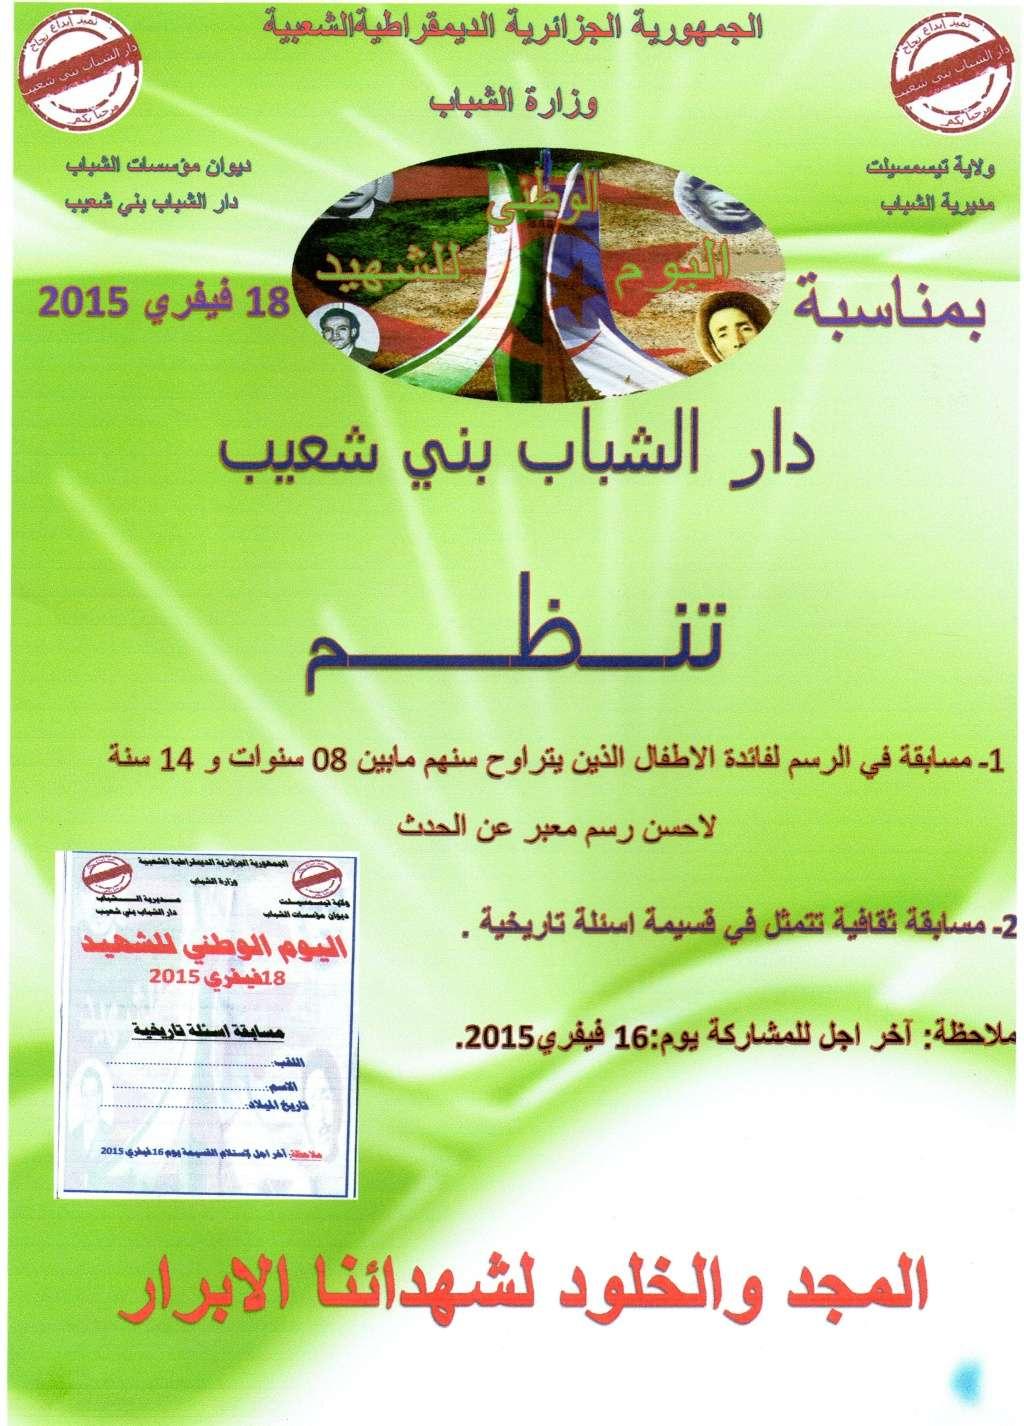 منتدى دار الشباب بني شعيب - نشاطات دار الشب Img00610